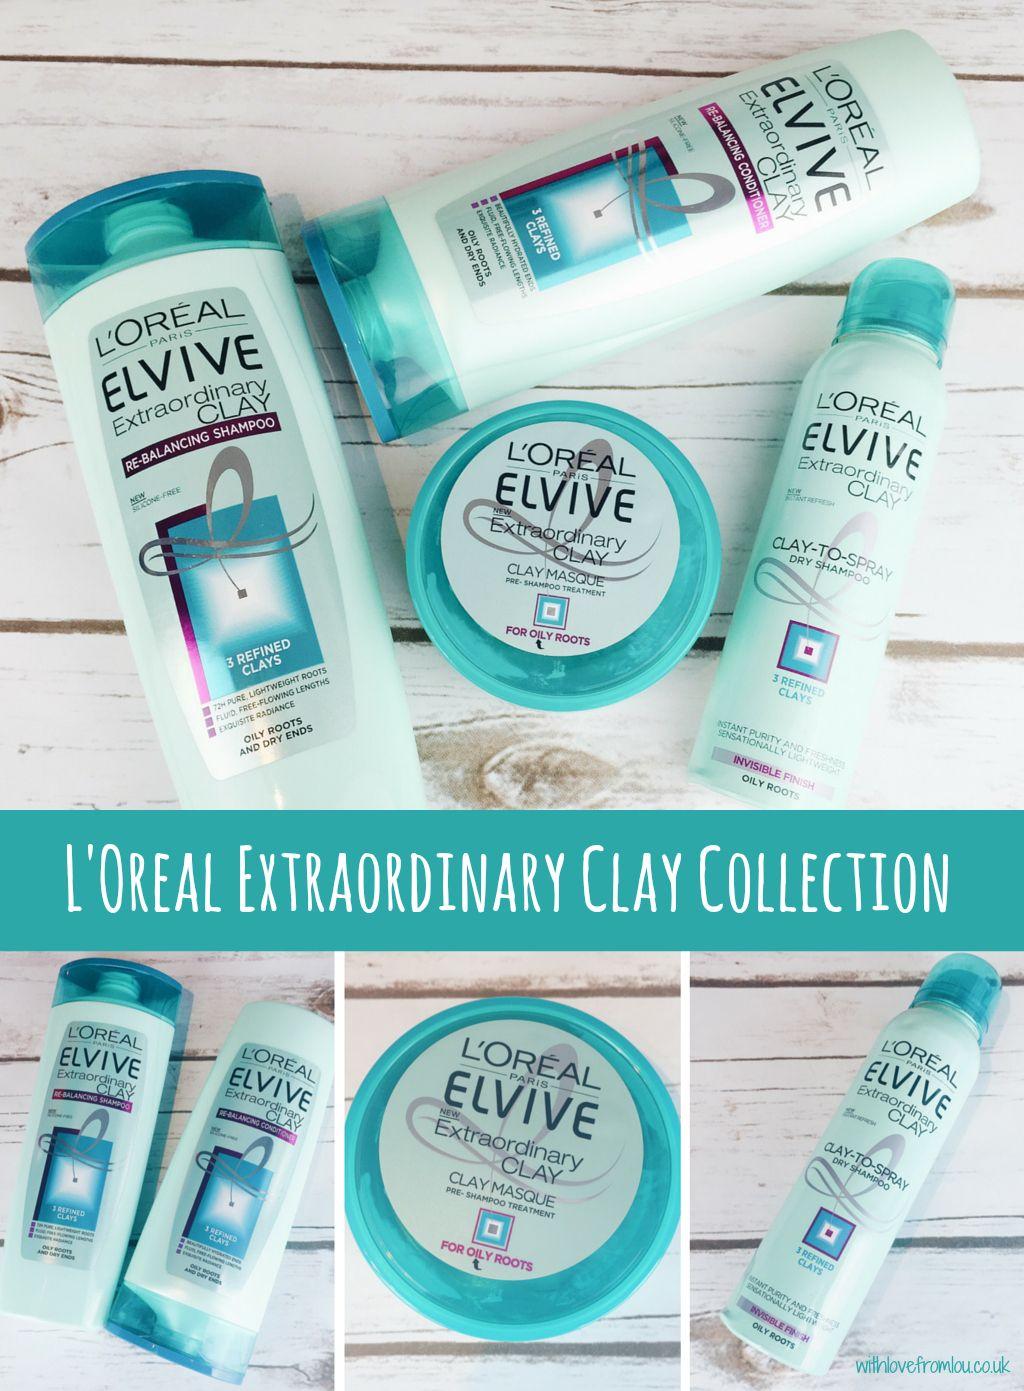 L'Oreal Extraordinary Clay Collection Loreal shampoo